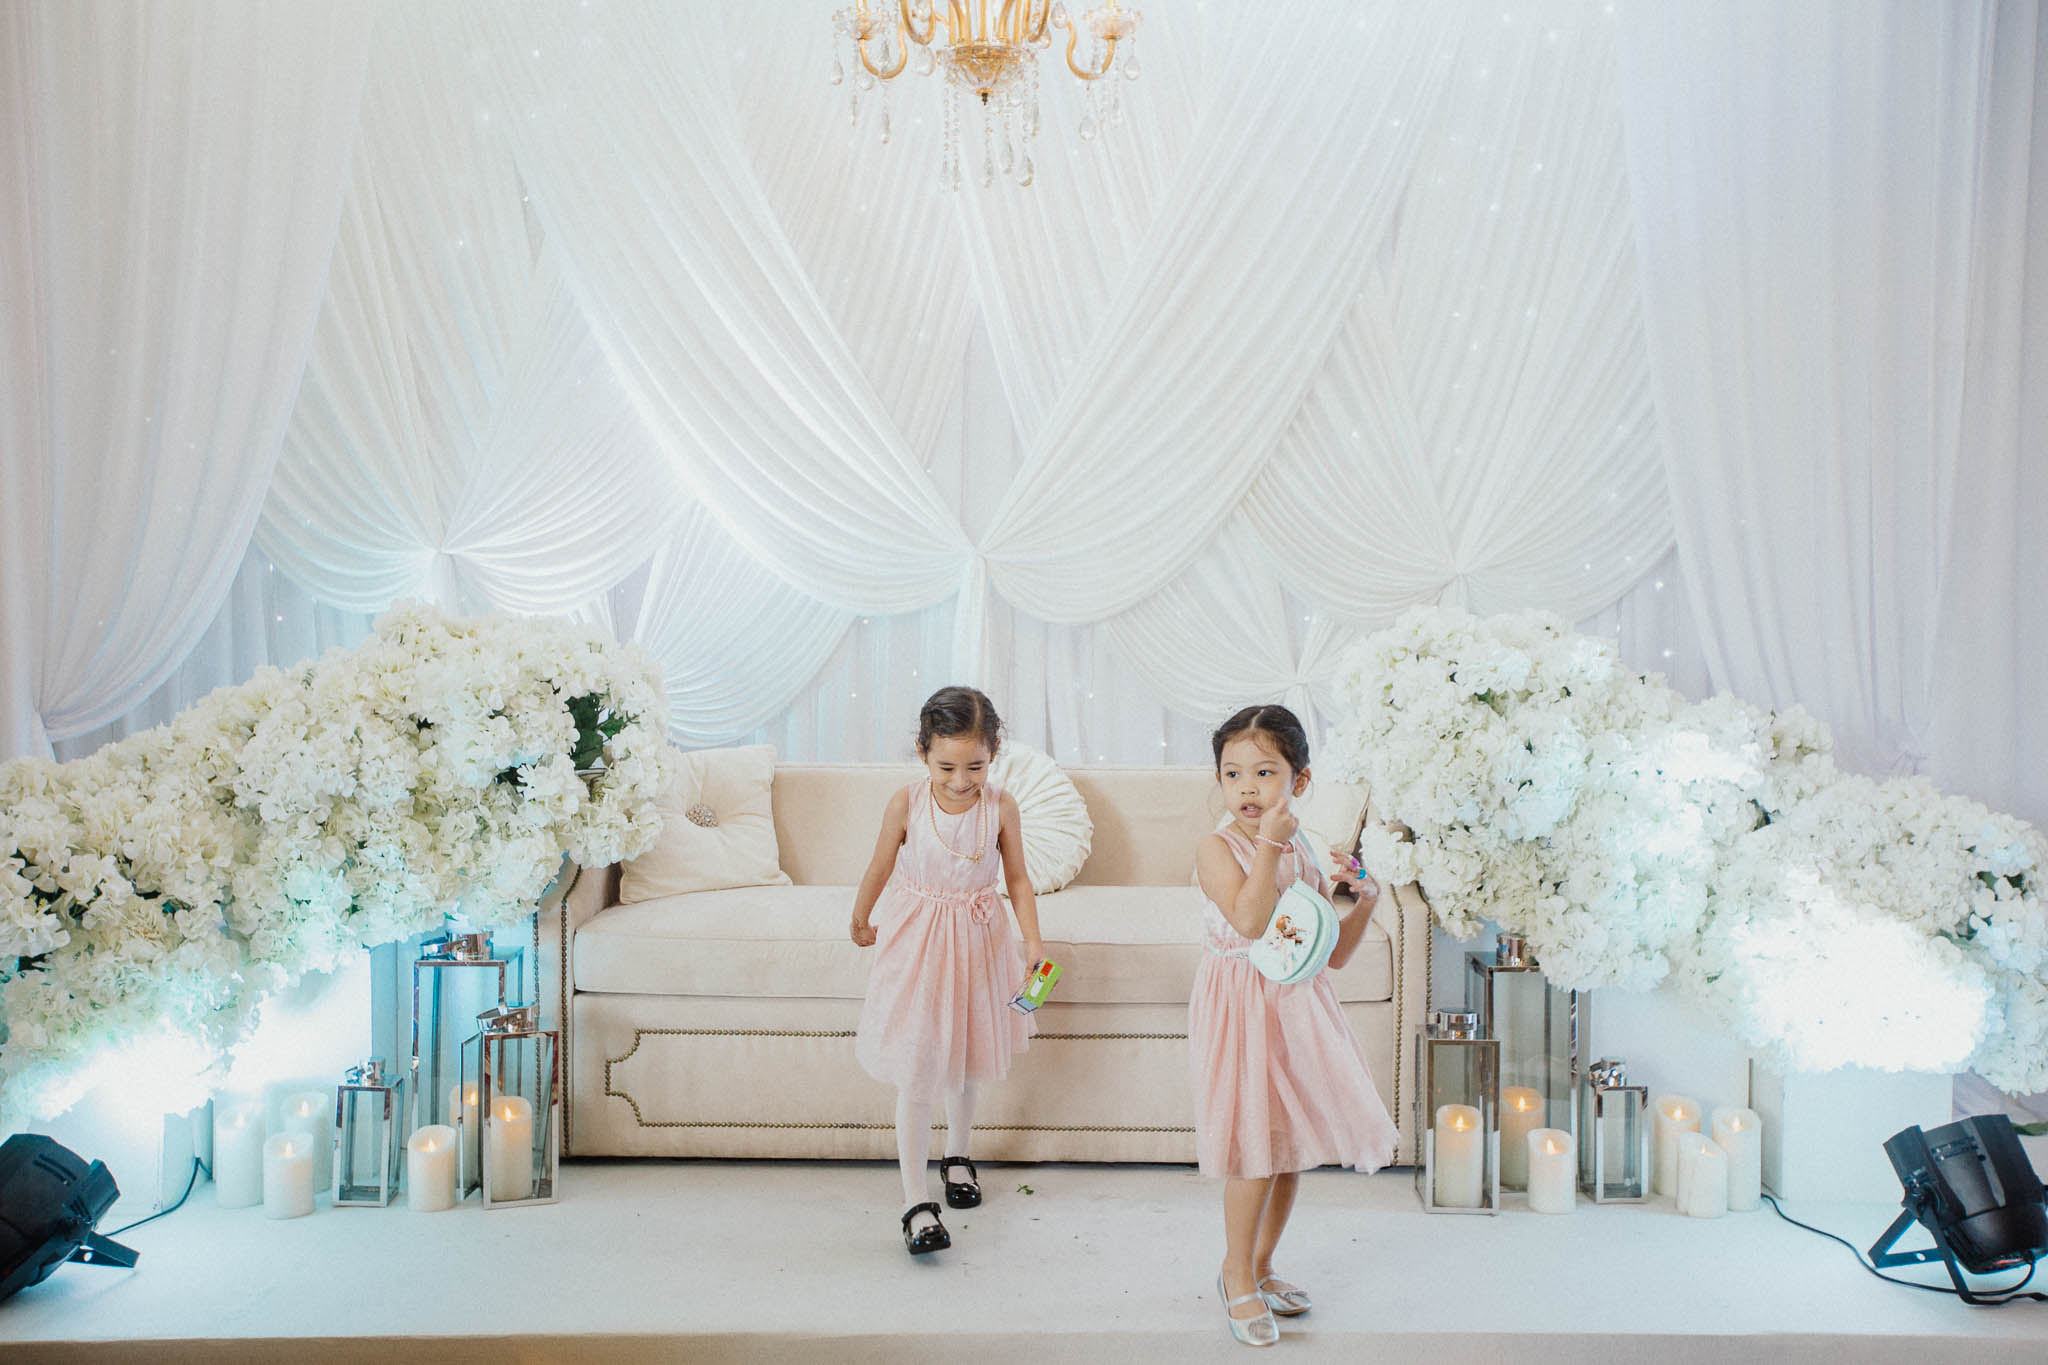 singapore-wedding-photographer-wedding-nufail-addafiq-038.jpg